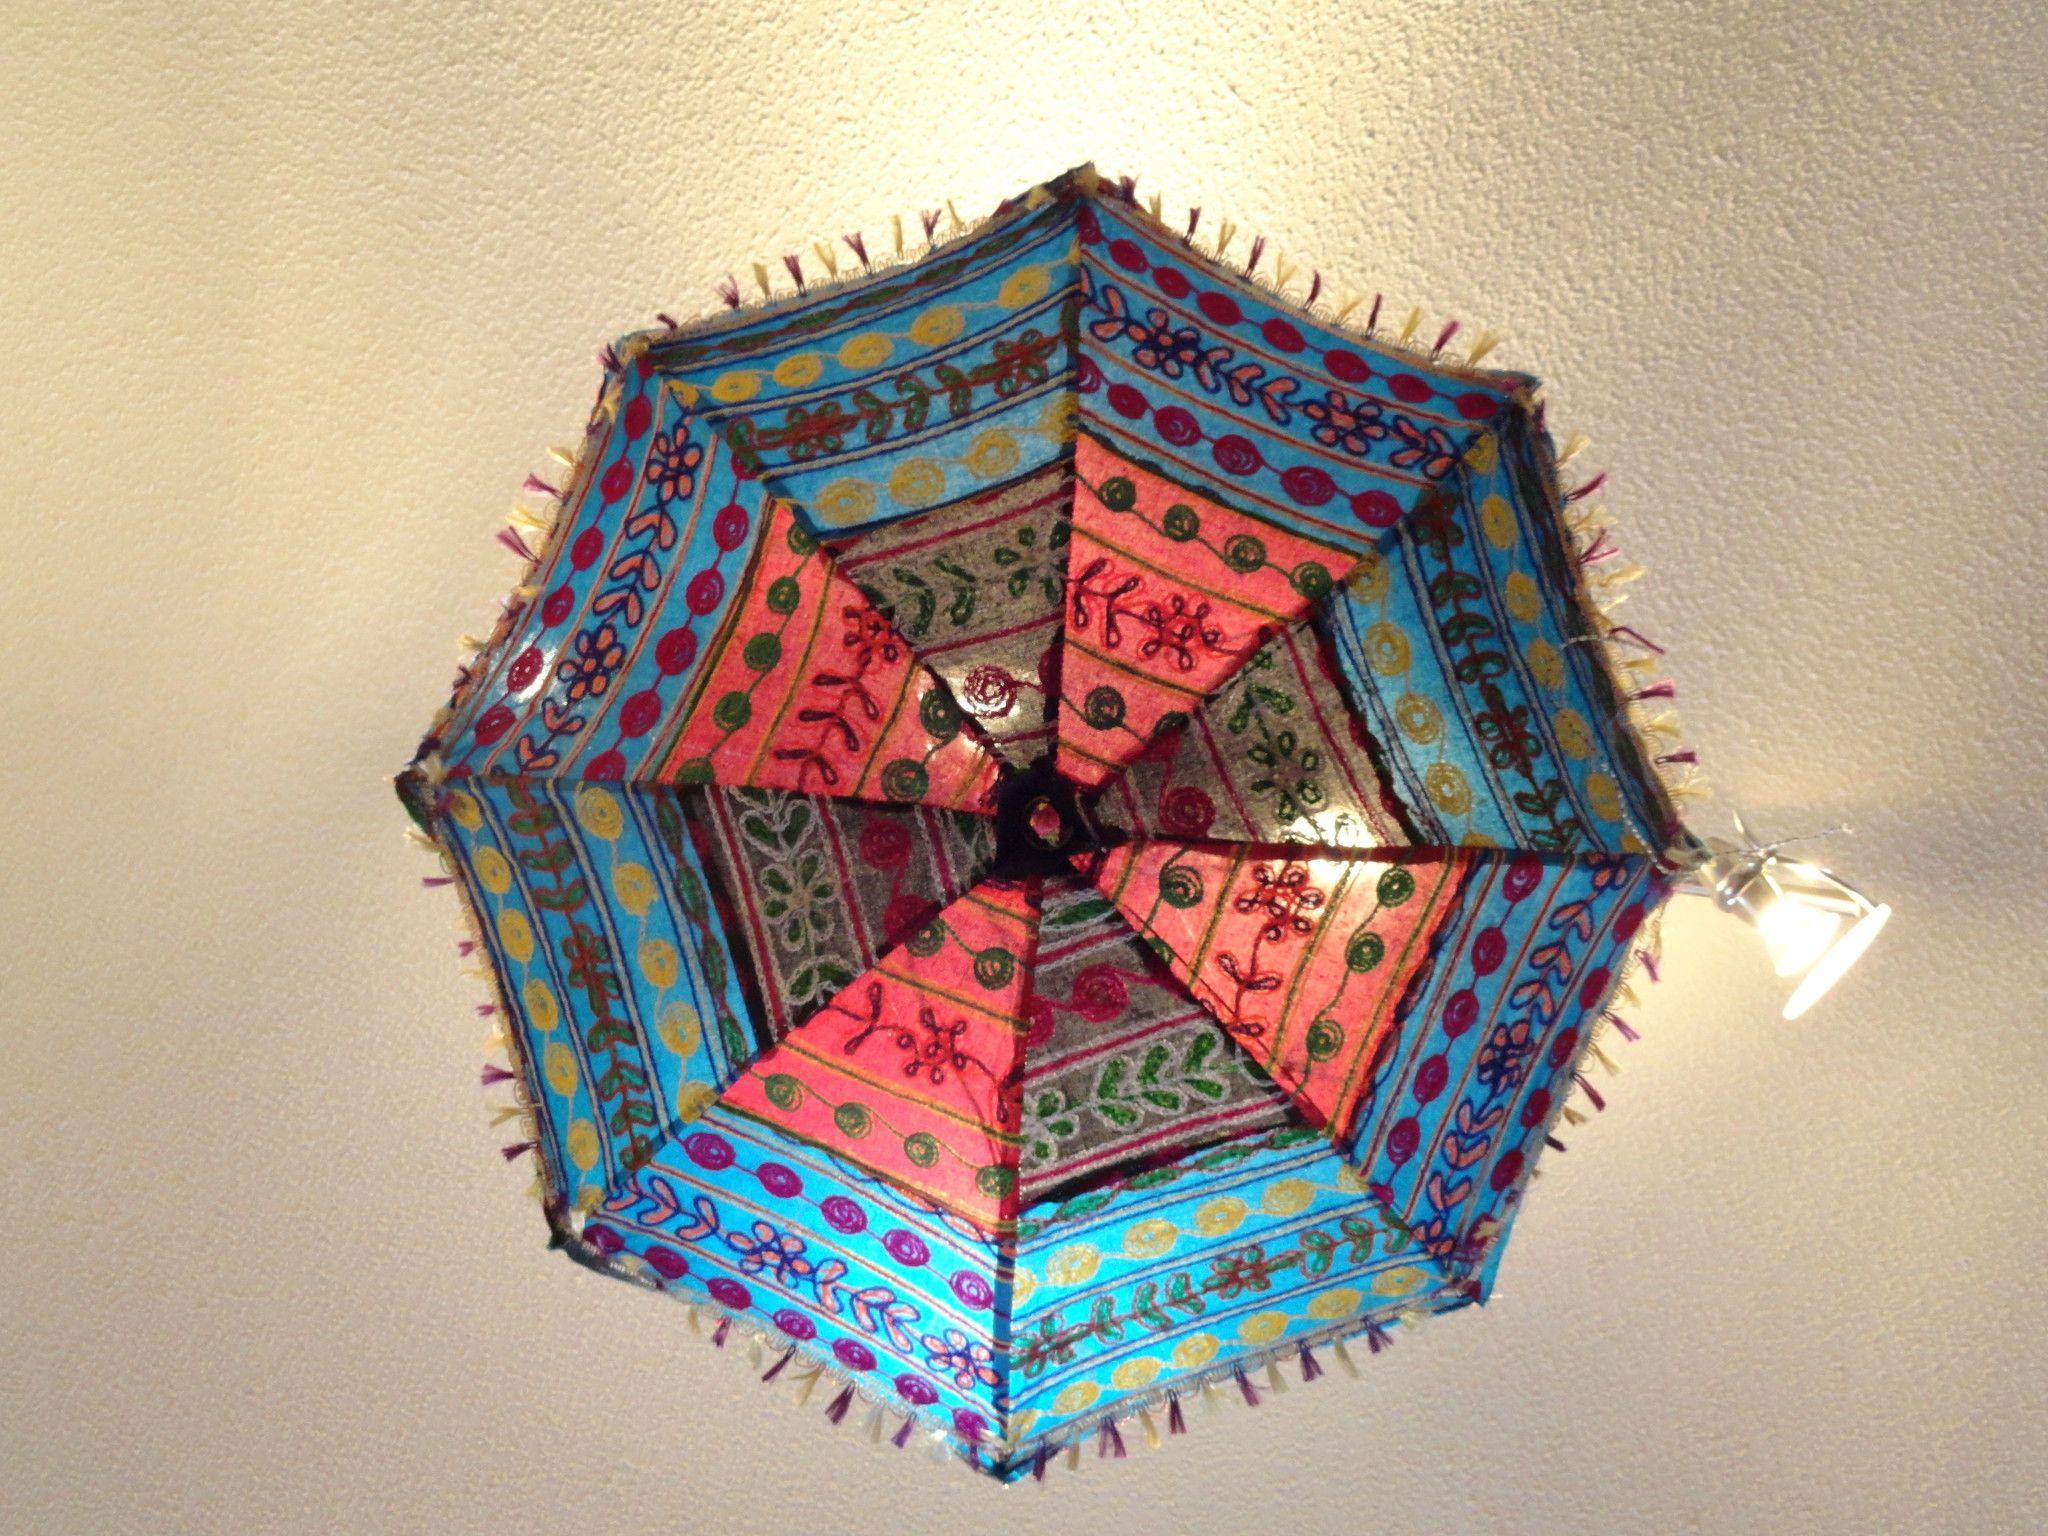 Indias fabric umbrella lamp shade colorful ethnic embroidered indias fabric umbrella lamp shade colorful ethnic embroidered ceiling lampshade decor ornament ethnic decor mozeypictures Images